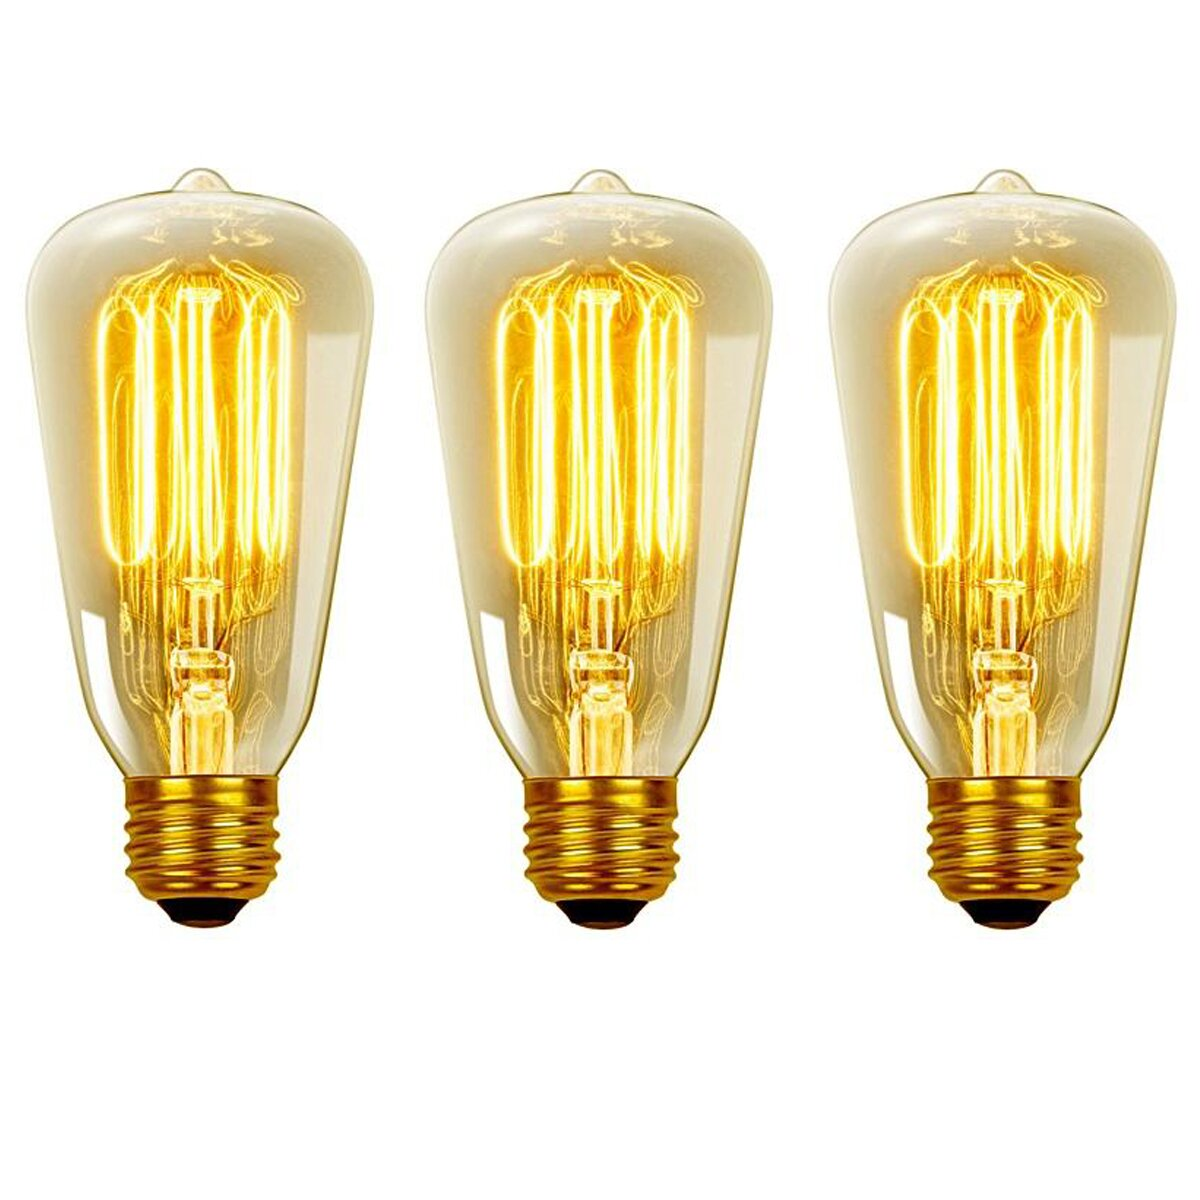 Vintage Edison 40 Watt 2700k S60 Squirrel Cage Incandescent Filament Light Bulb Wayfair